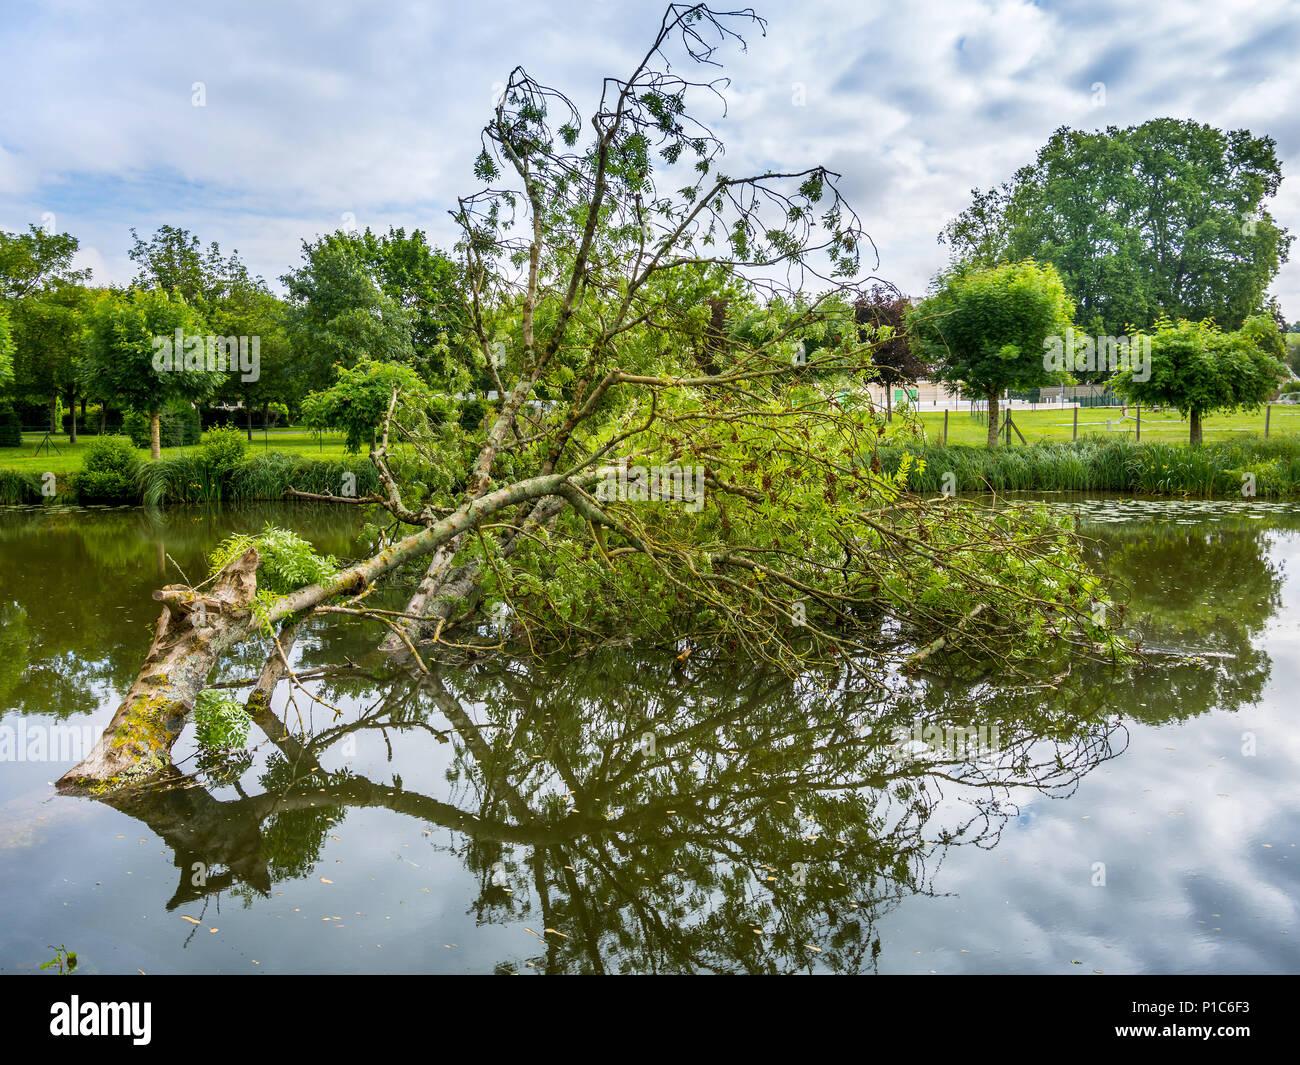 Storm damaged Ash tree fallen across river, France. - Stock Image